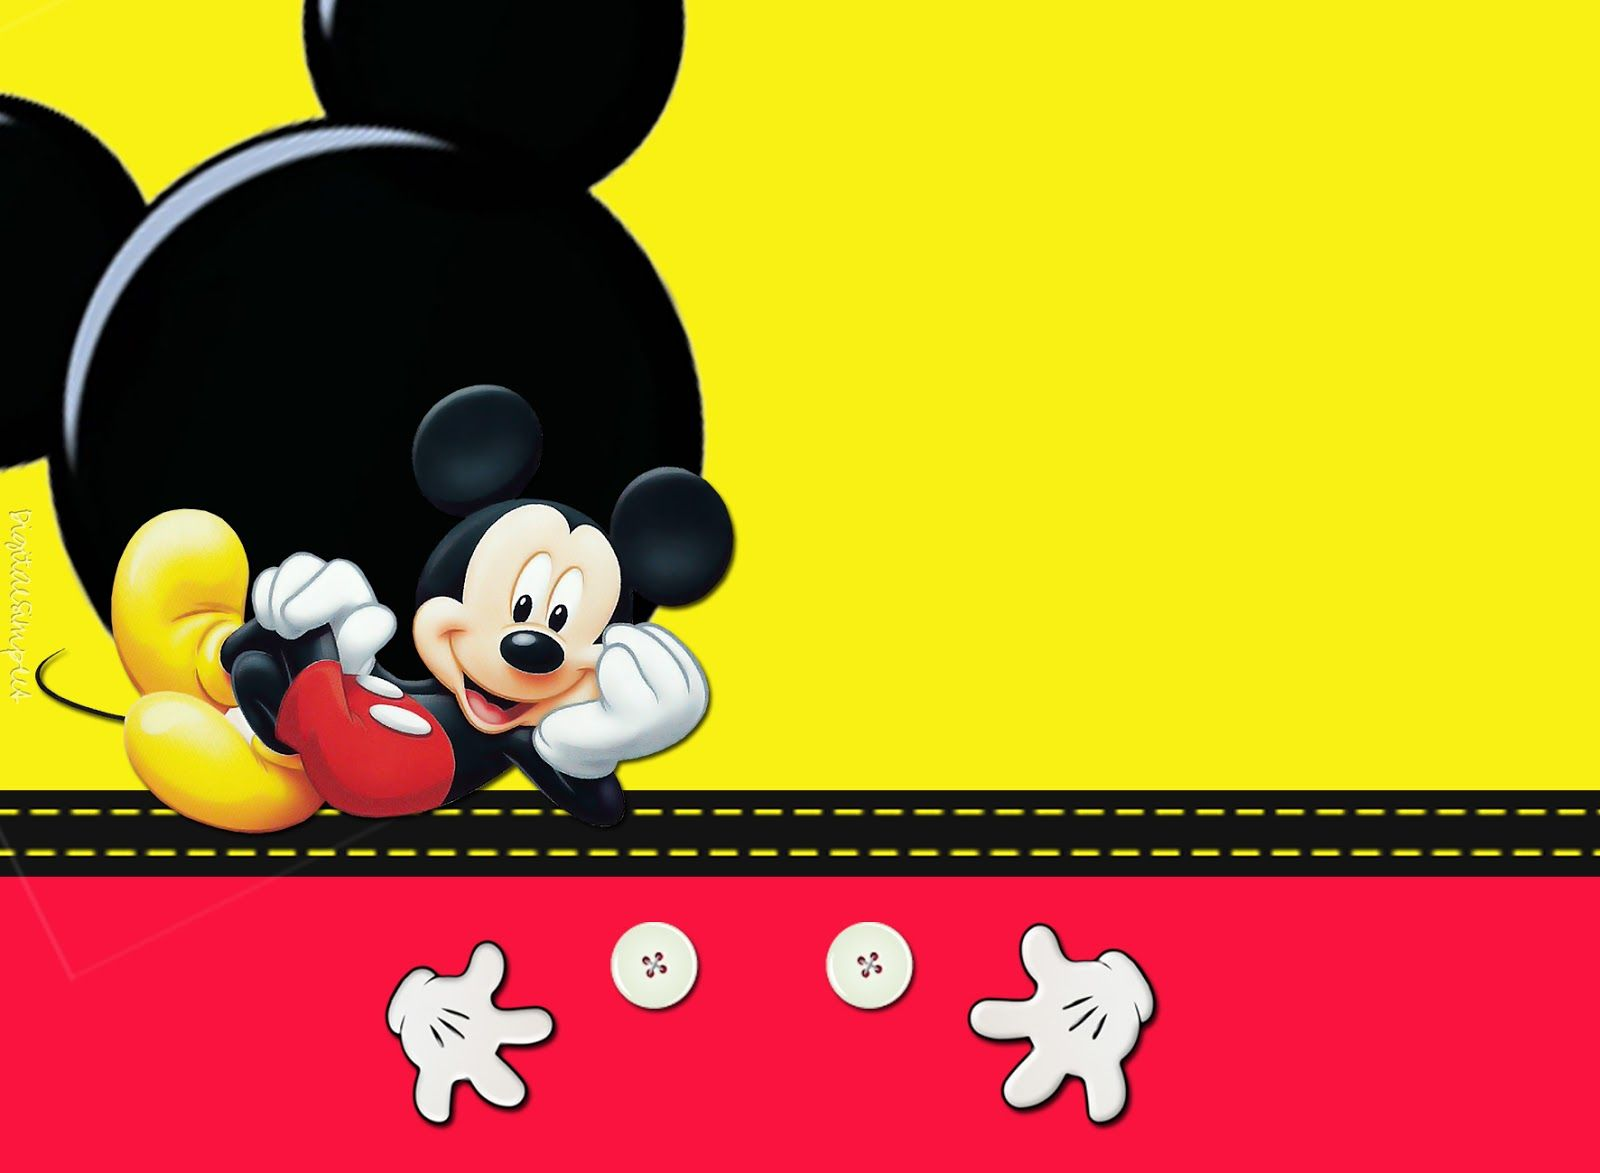 Convites Digitais Simples Kit Anivers Rio De Personalizados Tema Mickey Mouse